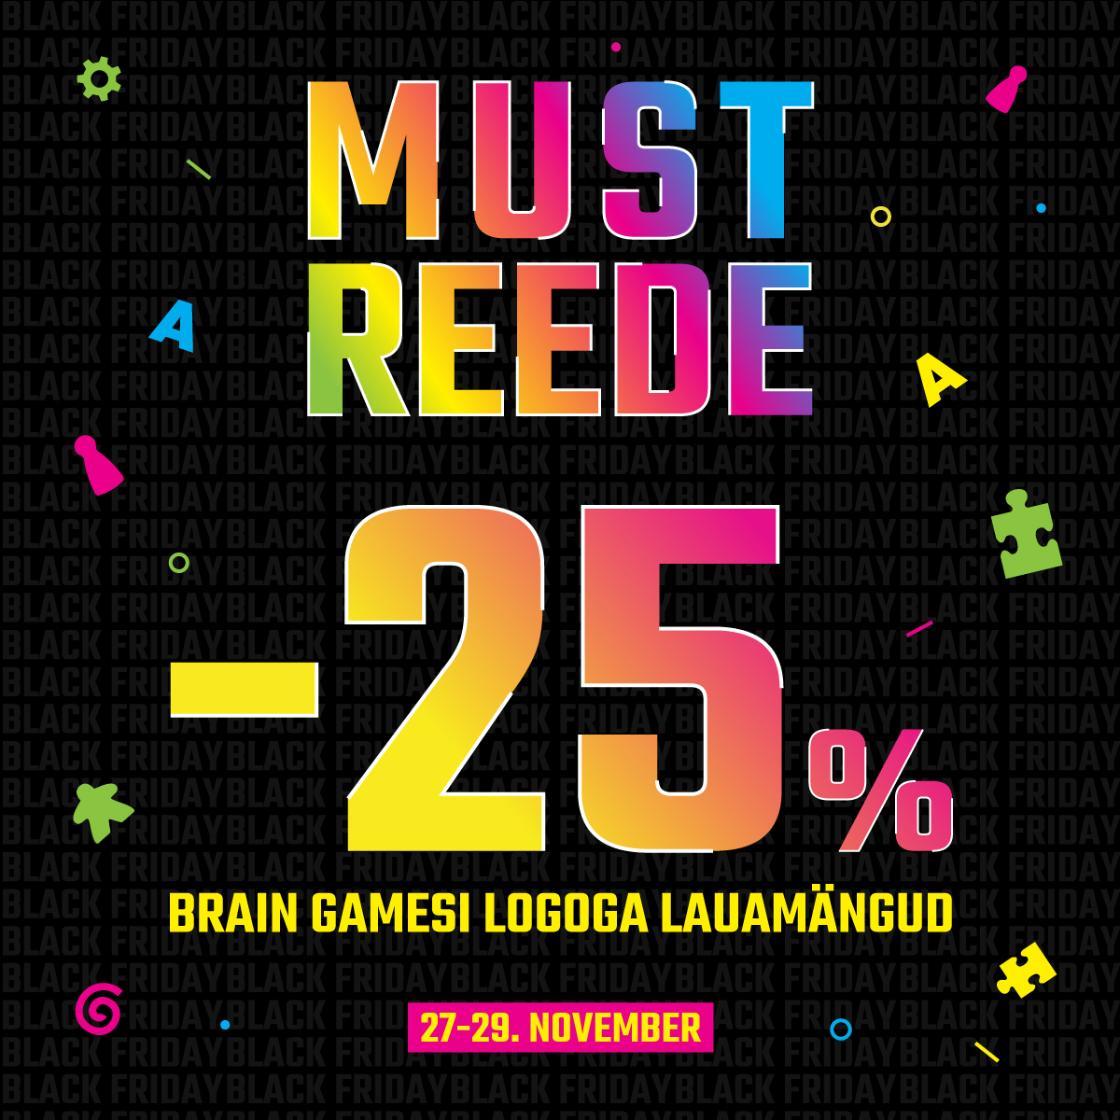 MUST REEDE! Brain Gamesi logoga lauamängud -25% - Brain Games